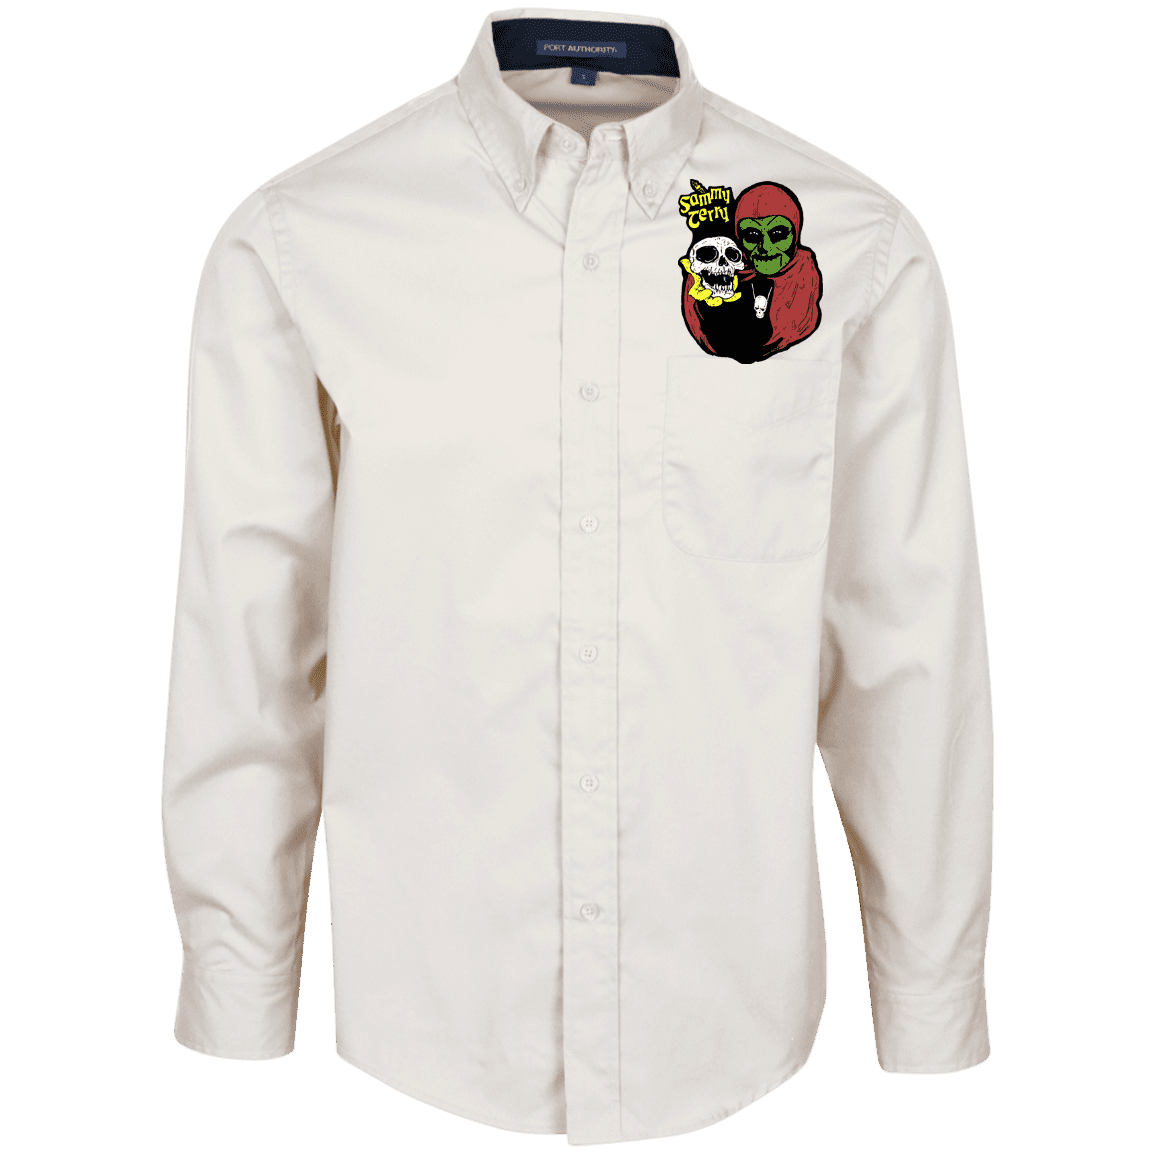 Sammy's Men Dress Shirts Casual